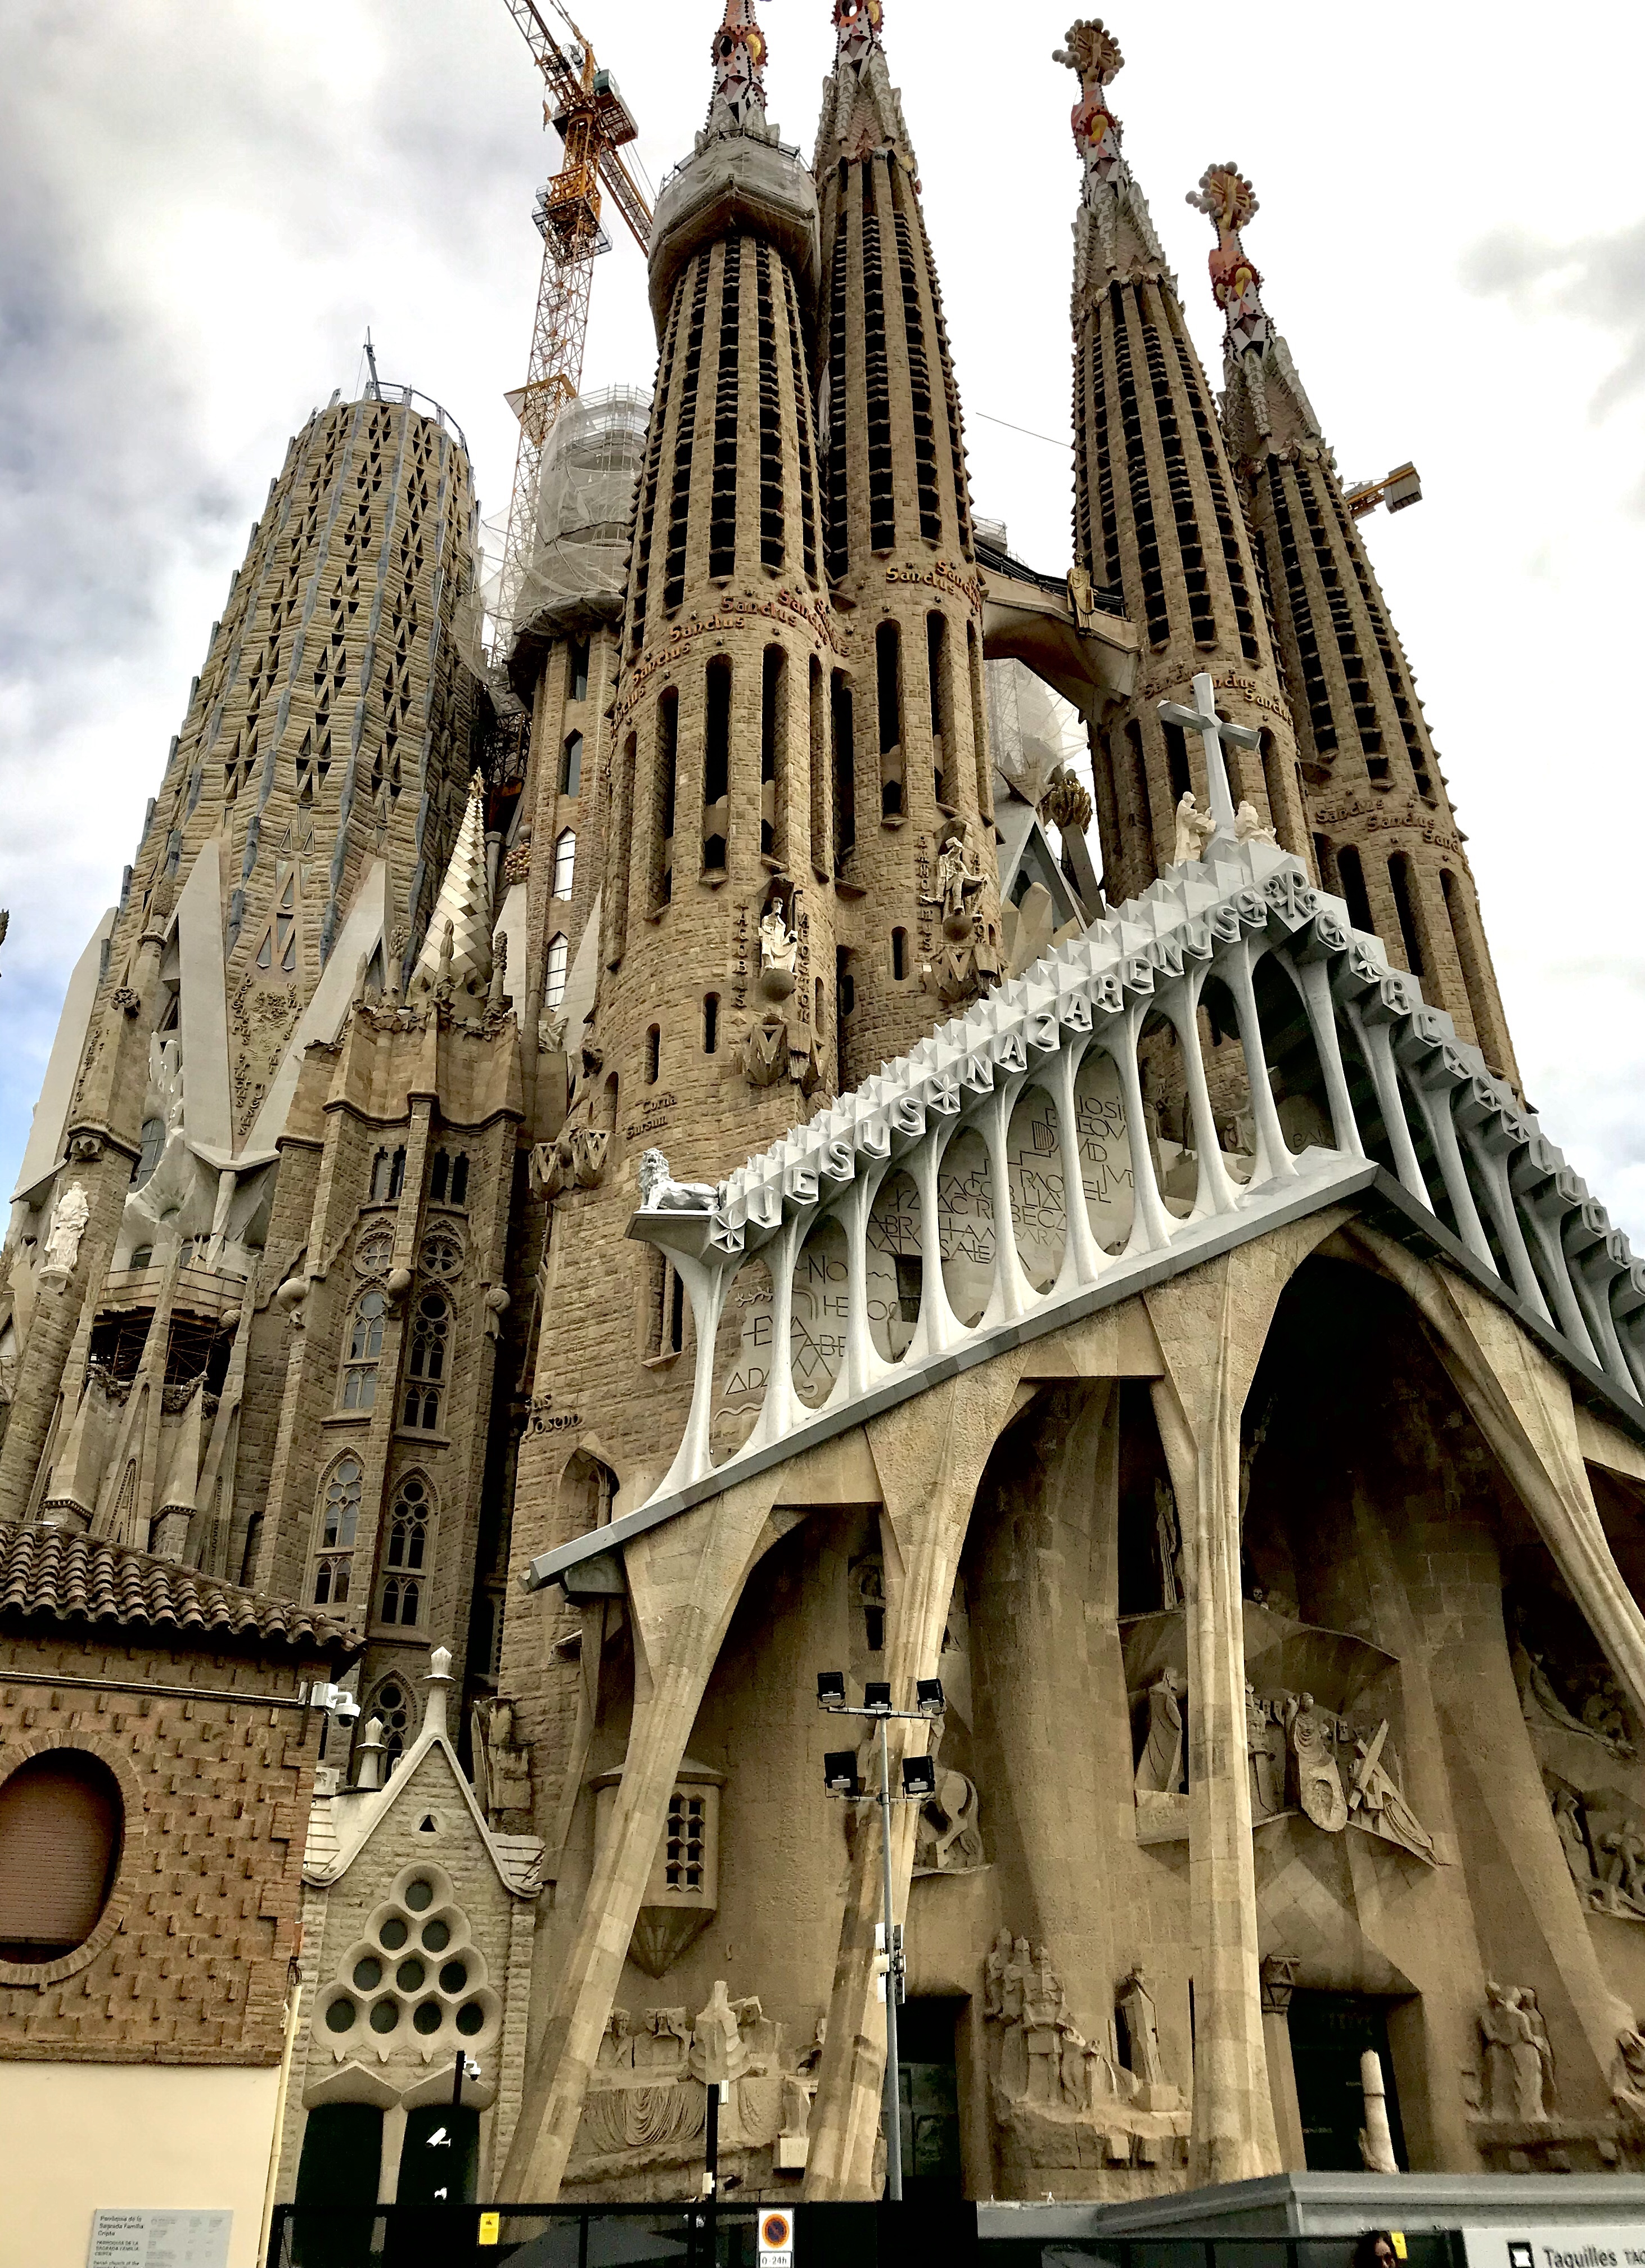 Barcelona Gaudi Sagrada Familia 2 Belle in Transit